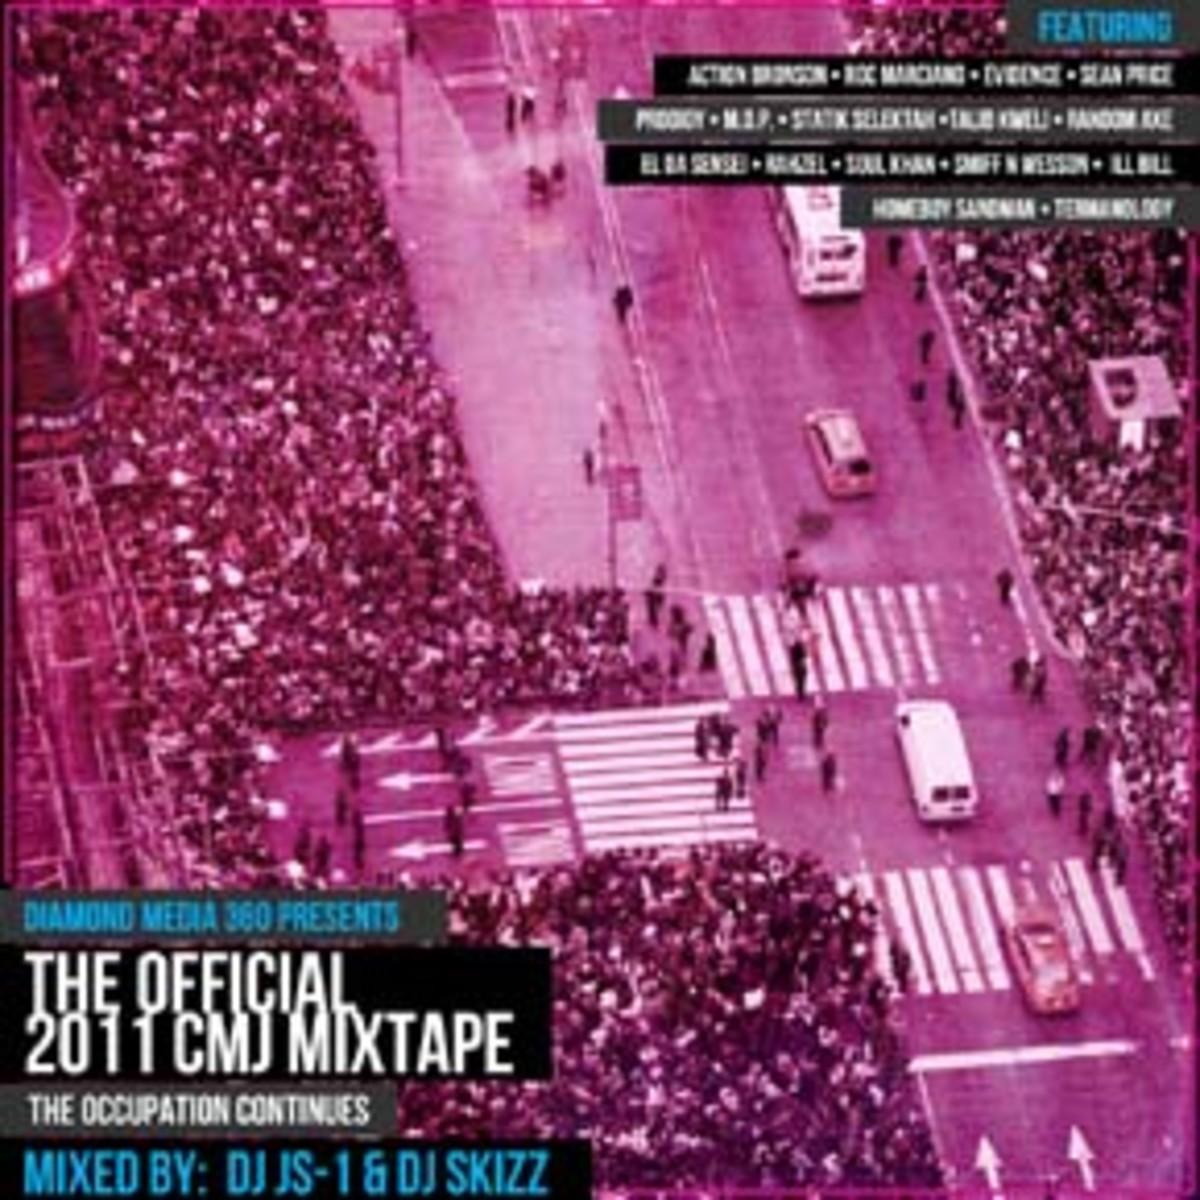 official-2011-cmj-mixtape-front.jpg